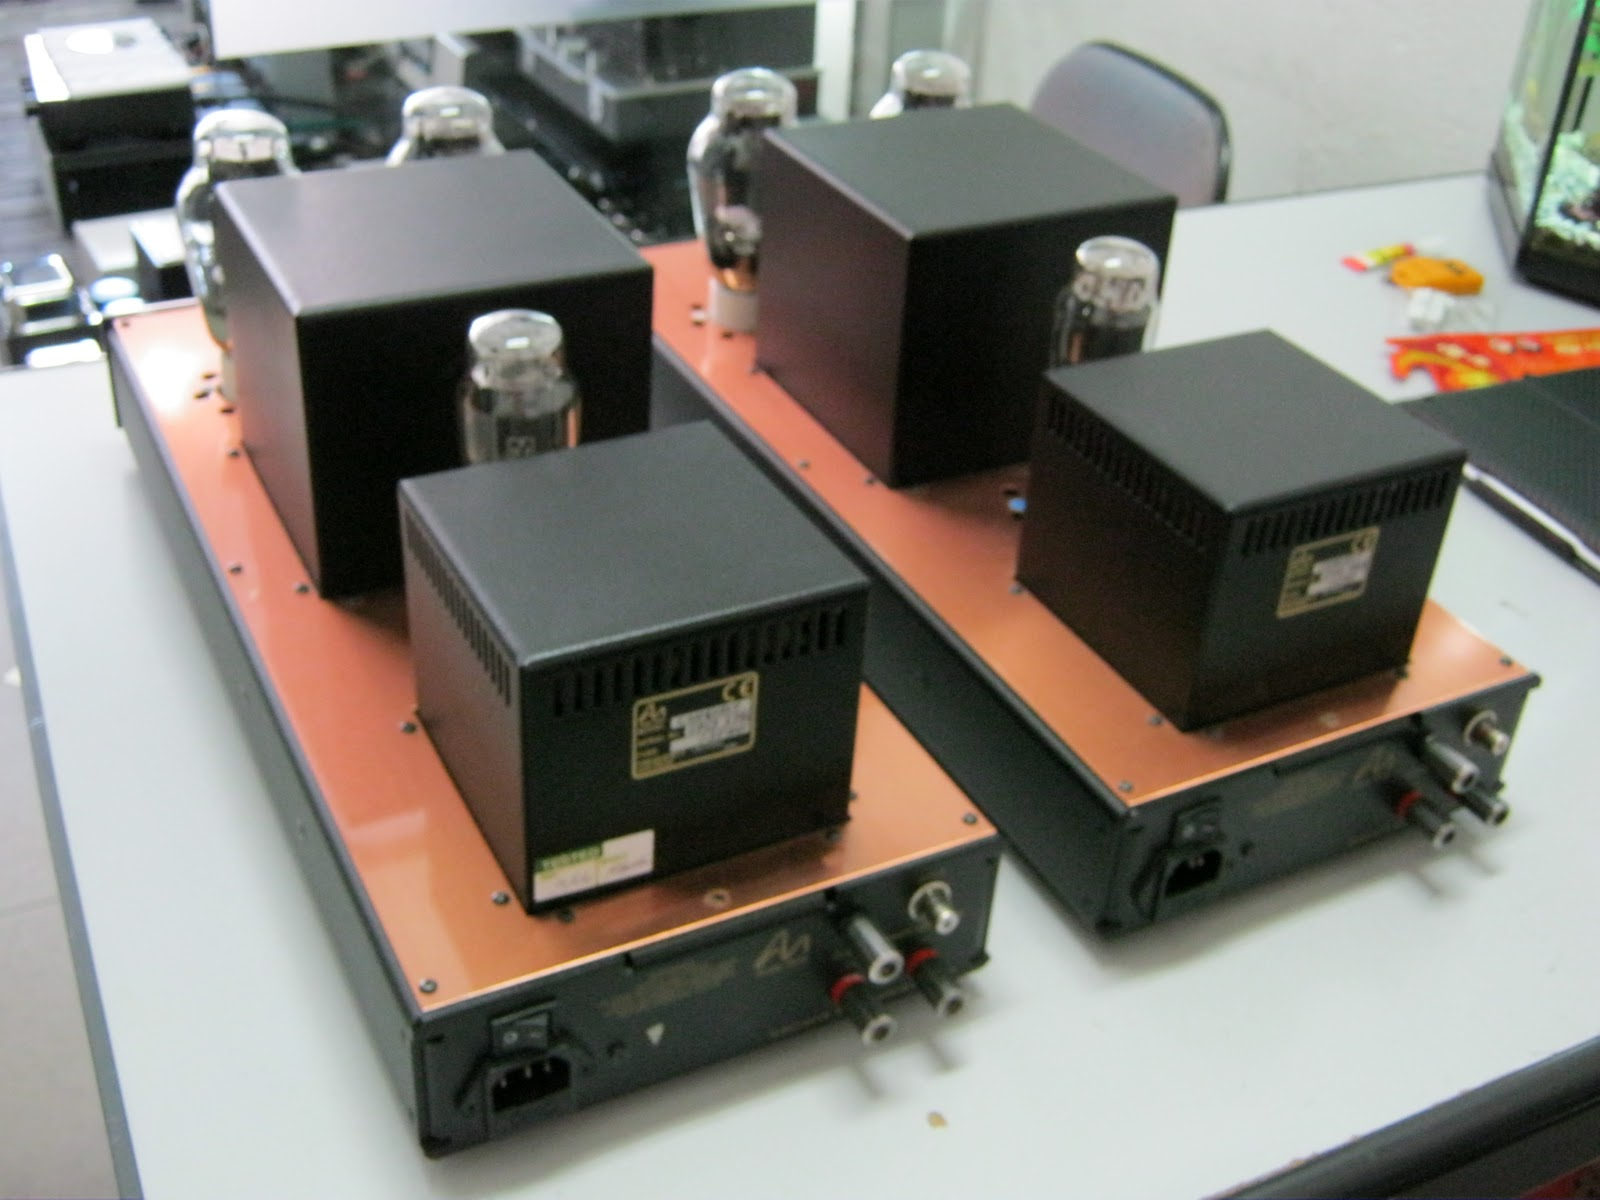 Happy Audio Visual: Audio note conquest 300B mono block (used)sold